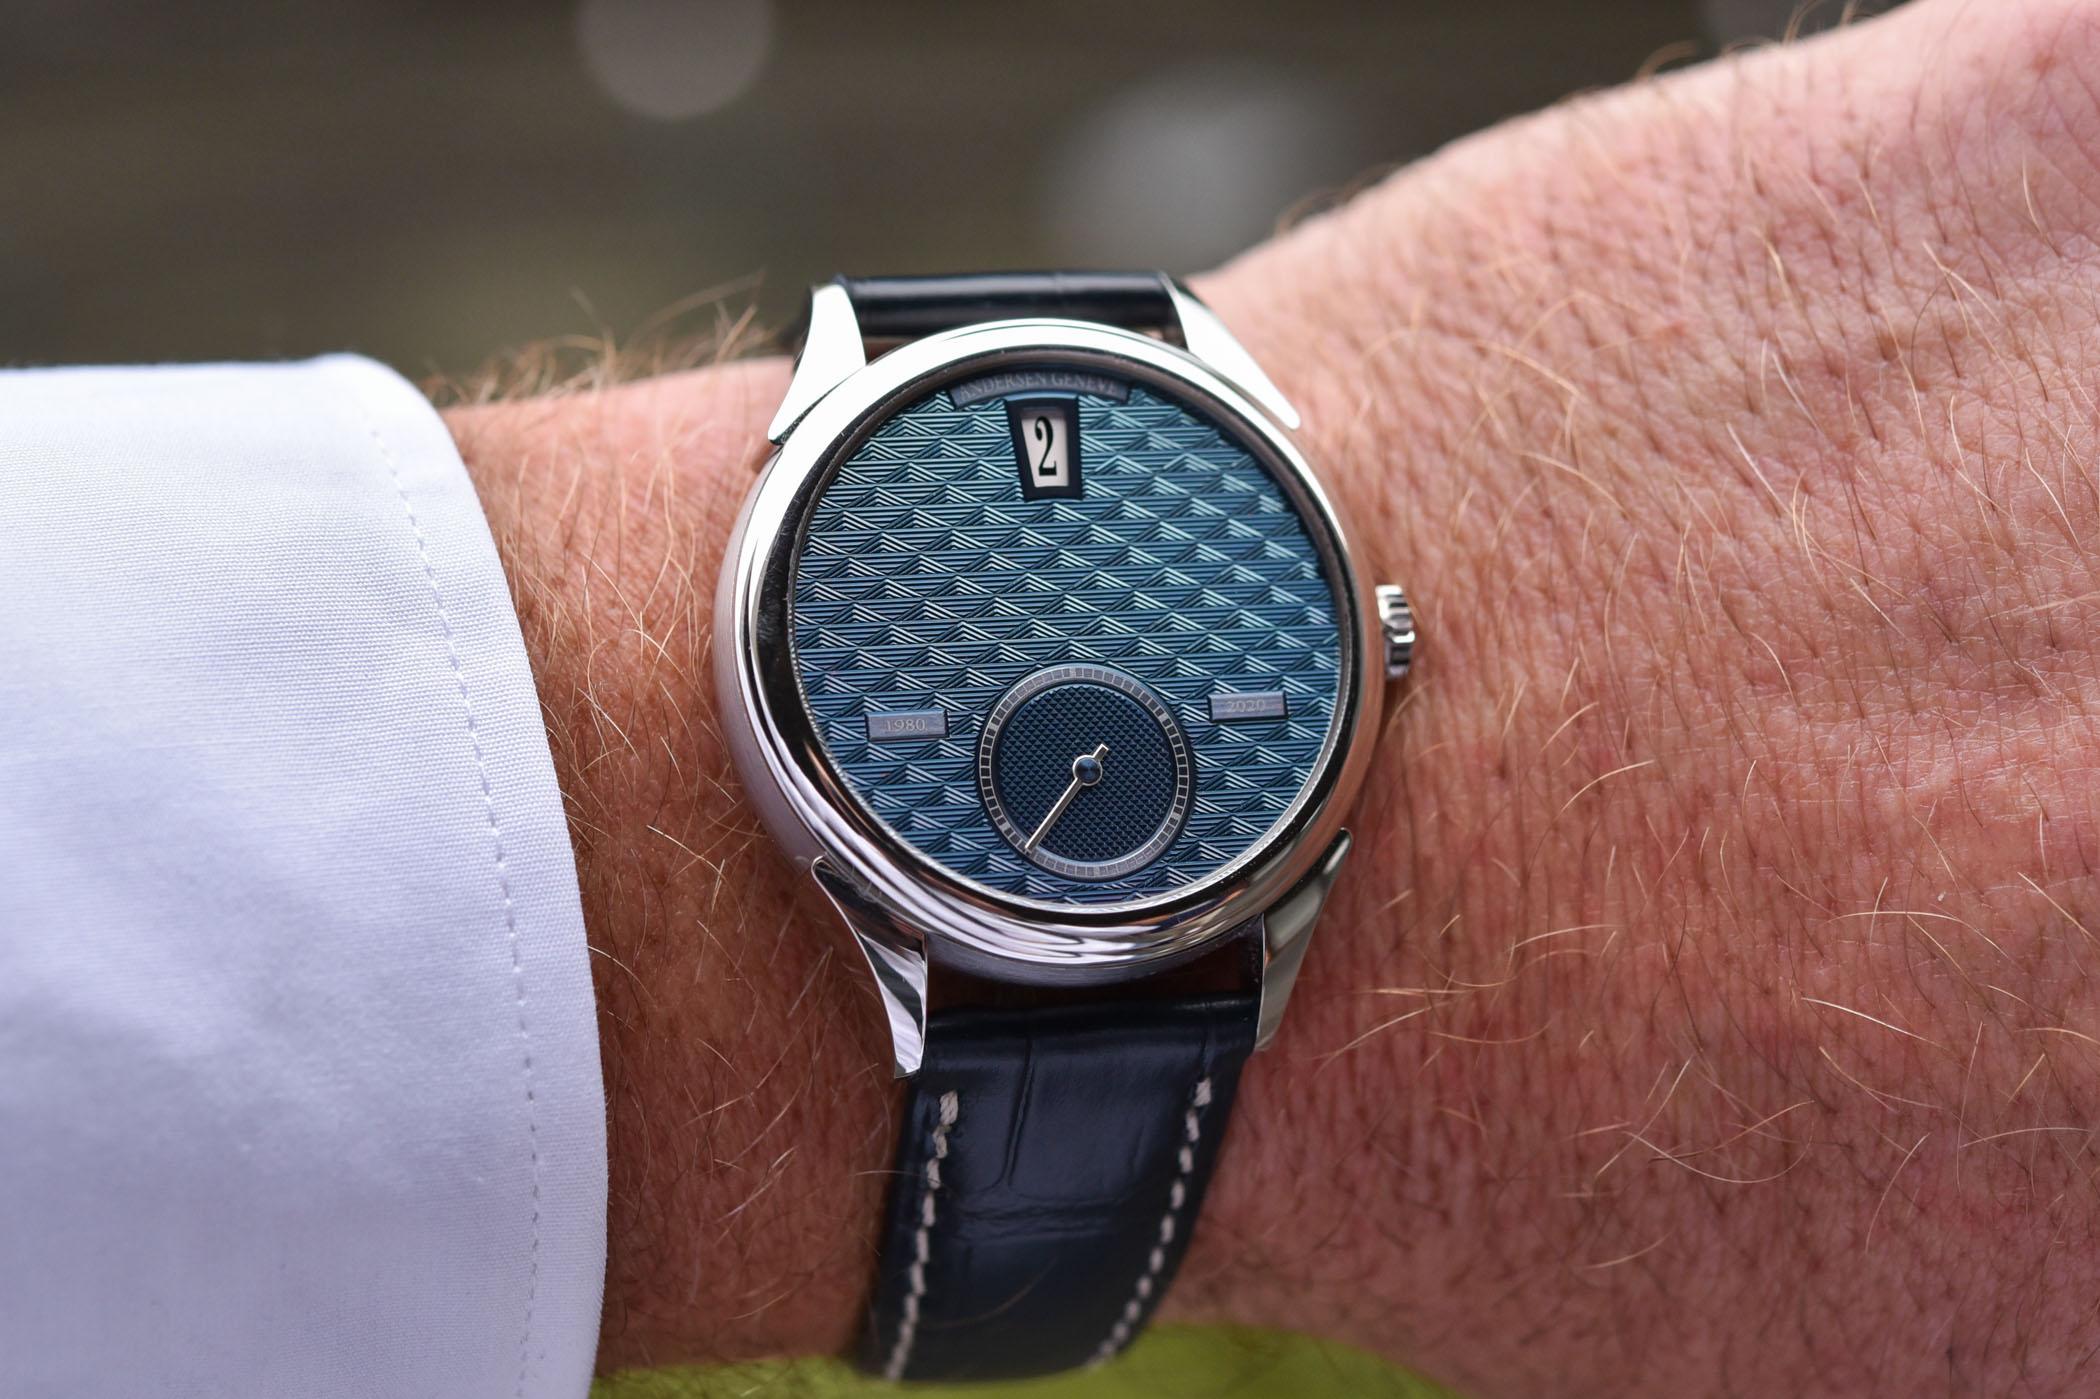 Svend Andersen Geneve 40th anniversary - Jumping Hour Watch - 1